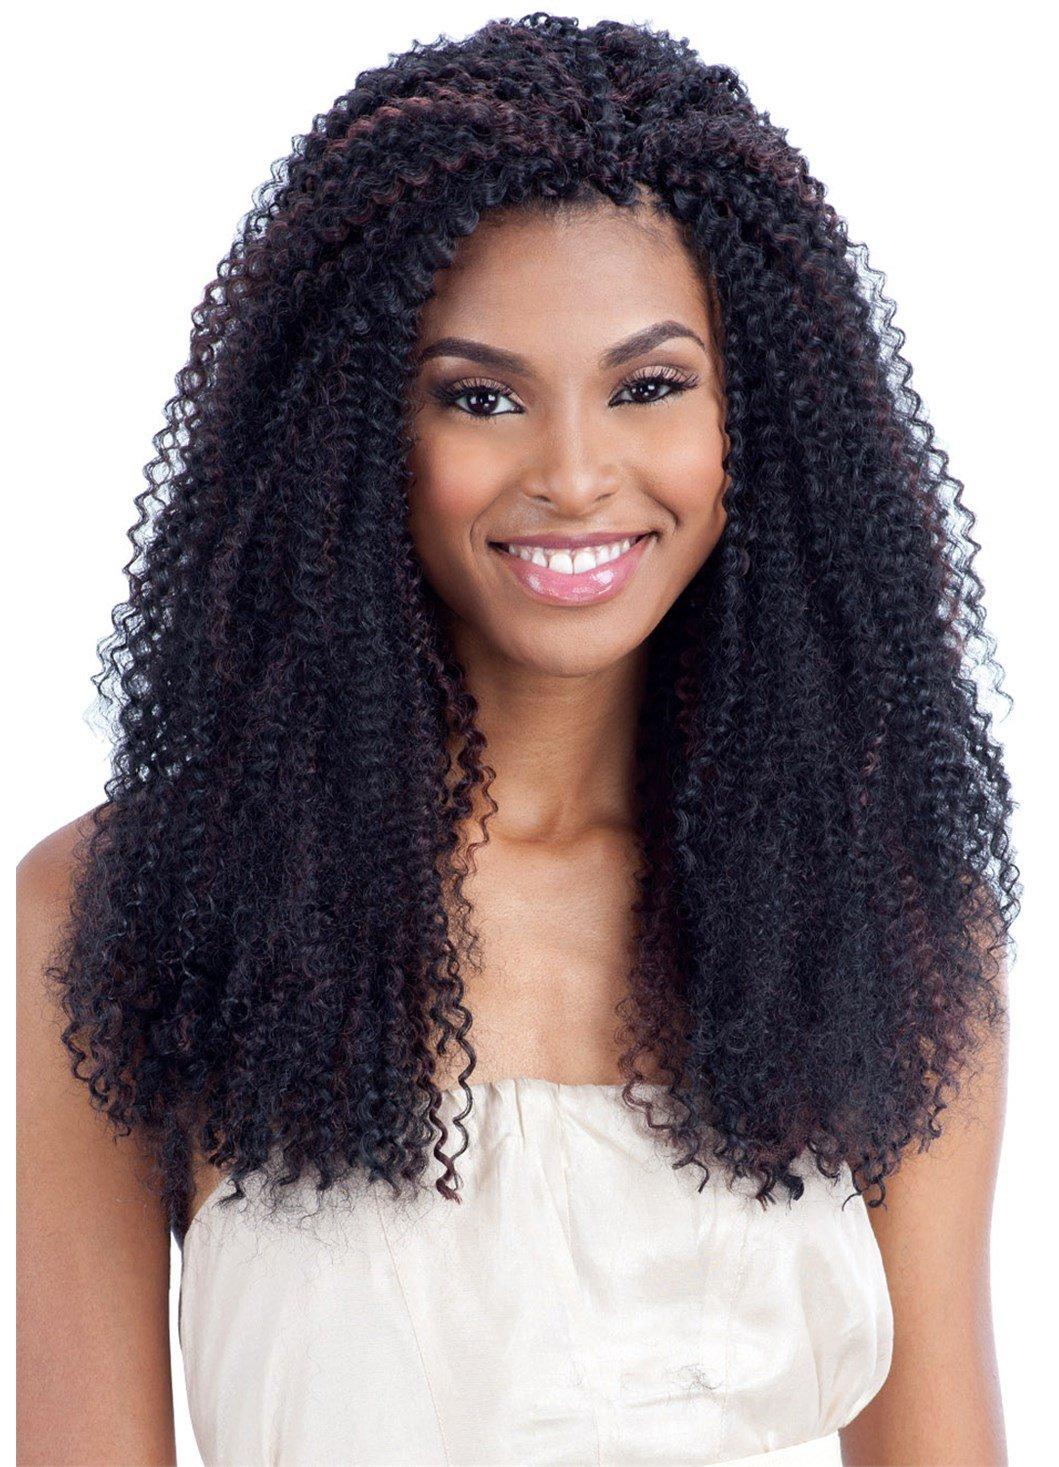 Model model glance kinky bohemian hair extensions 18 30 amazon model model glance kinky bohemian hair extensions 18 30 amazon beauty pmusecretfo Choice Image